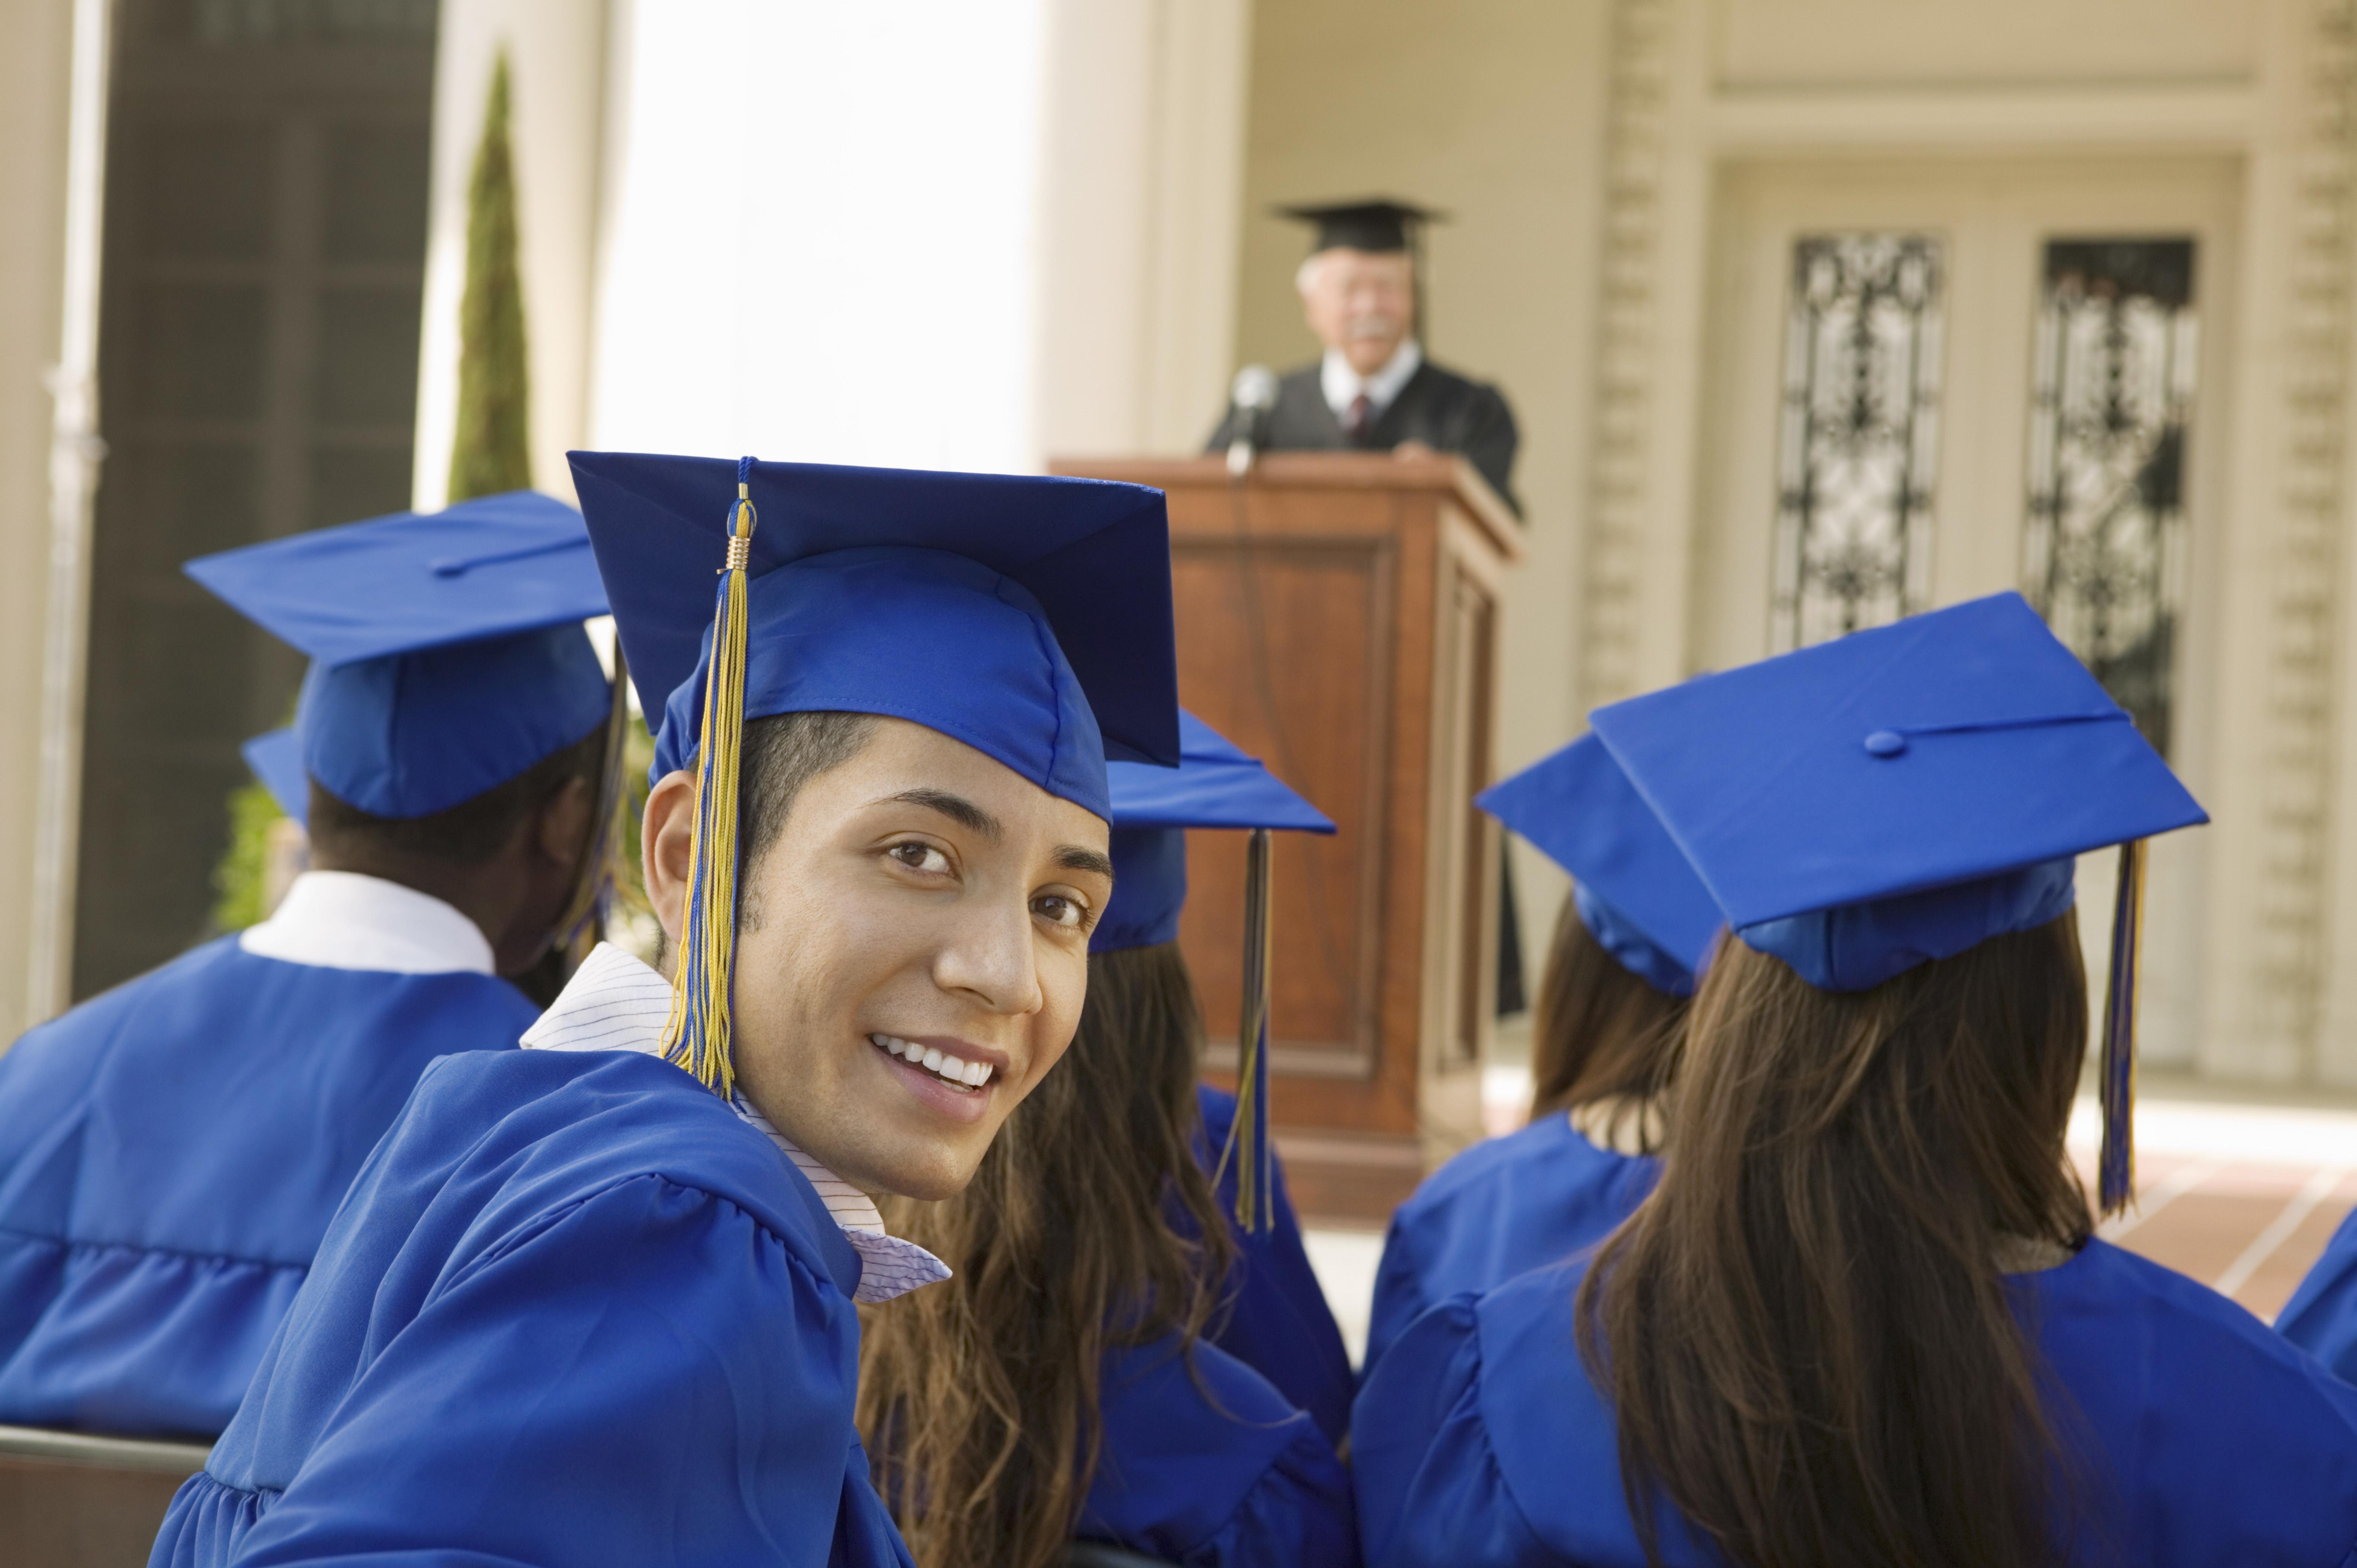 Hispanic student in graduation gown and graduation cap